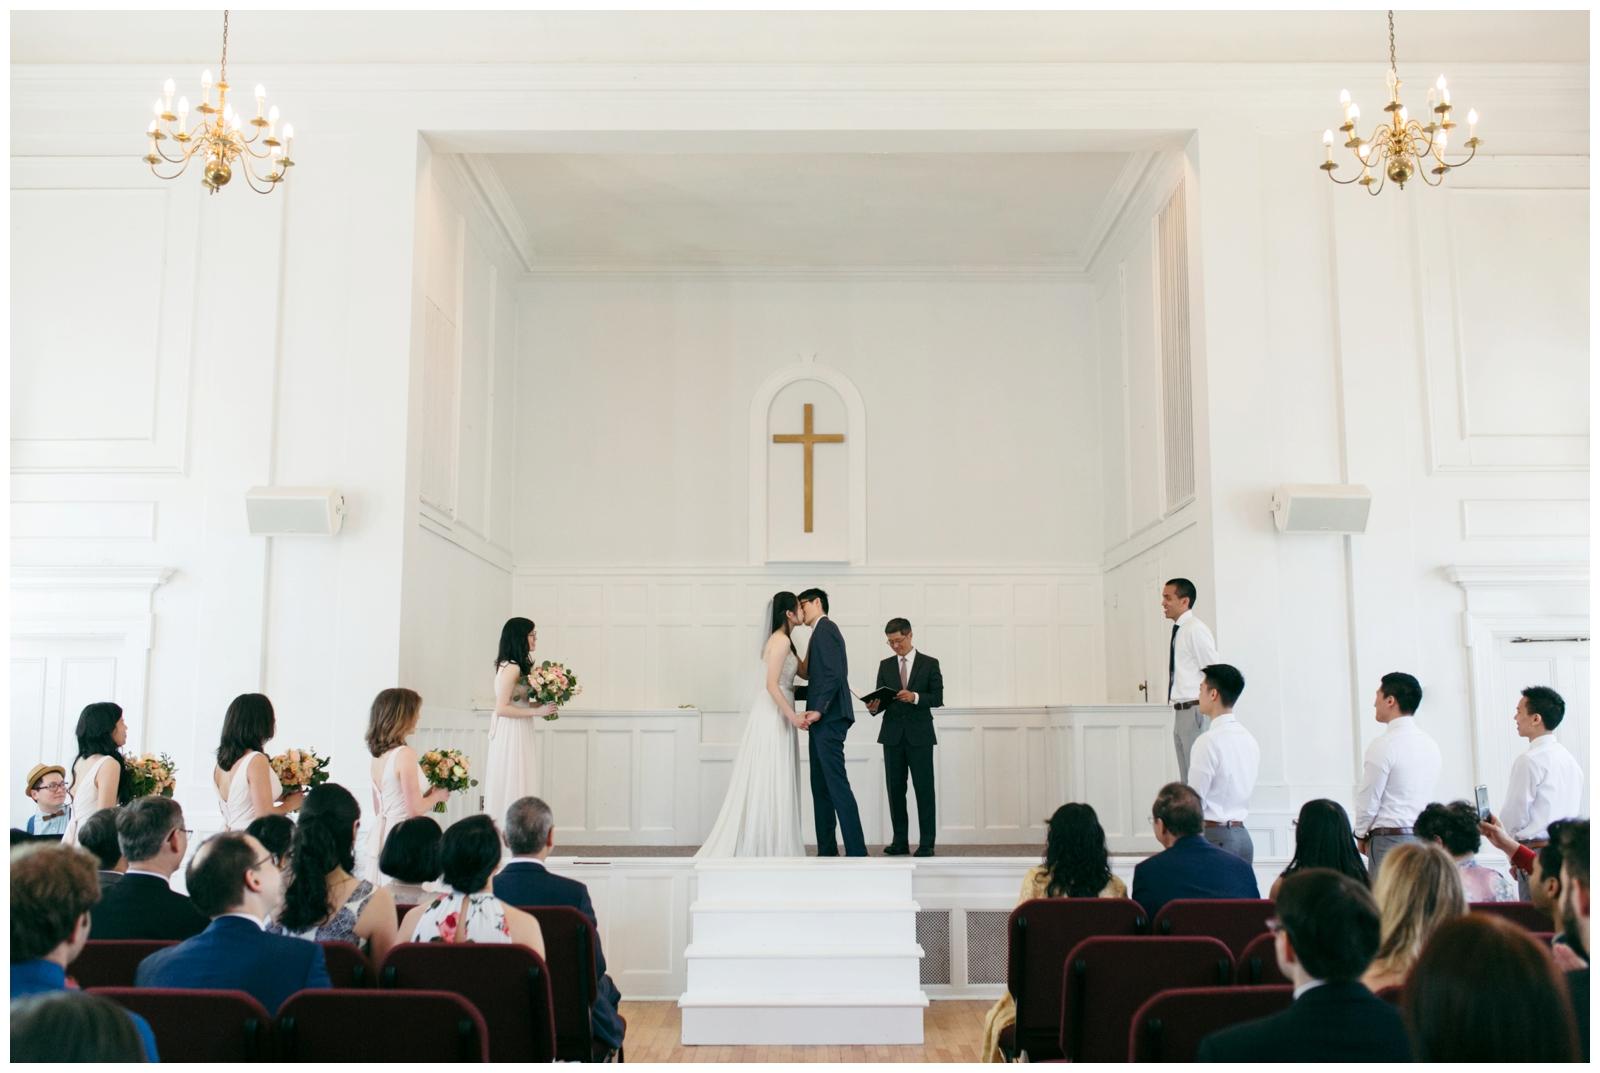 Samberg-Conference-Center-Boston-Wedding-Photographer-Bailey-Q-Photo-062.jpg